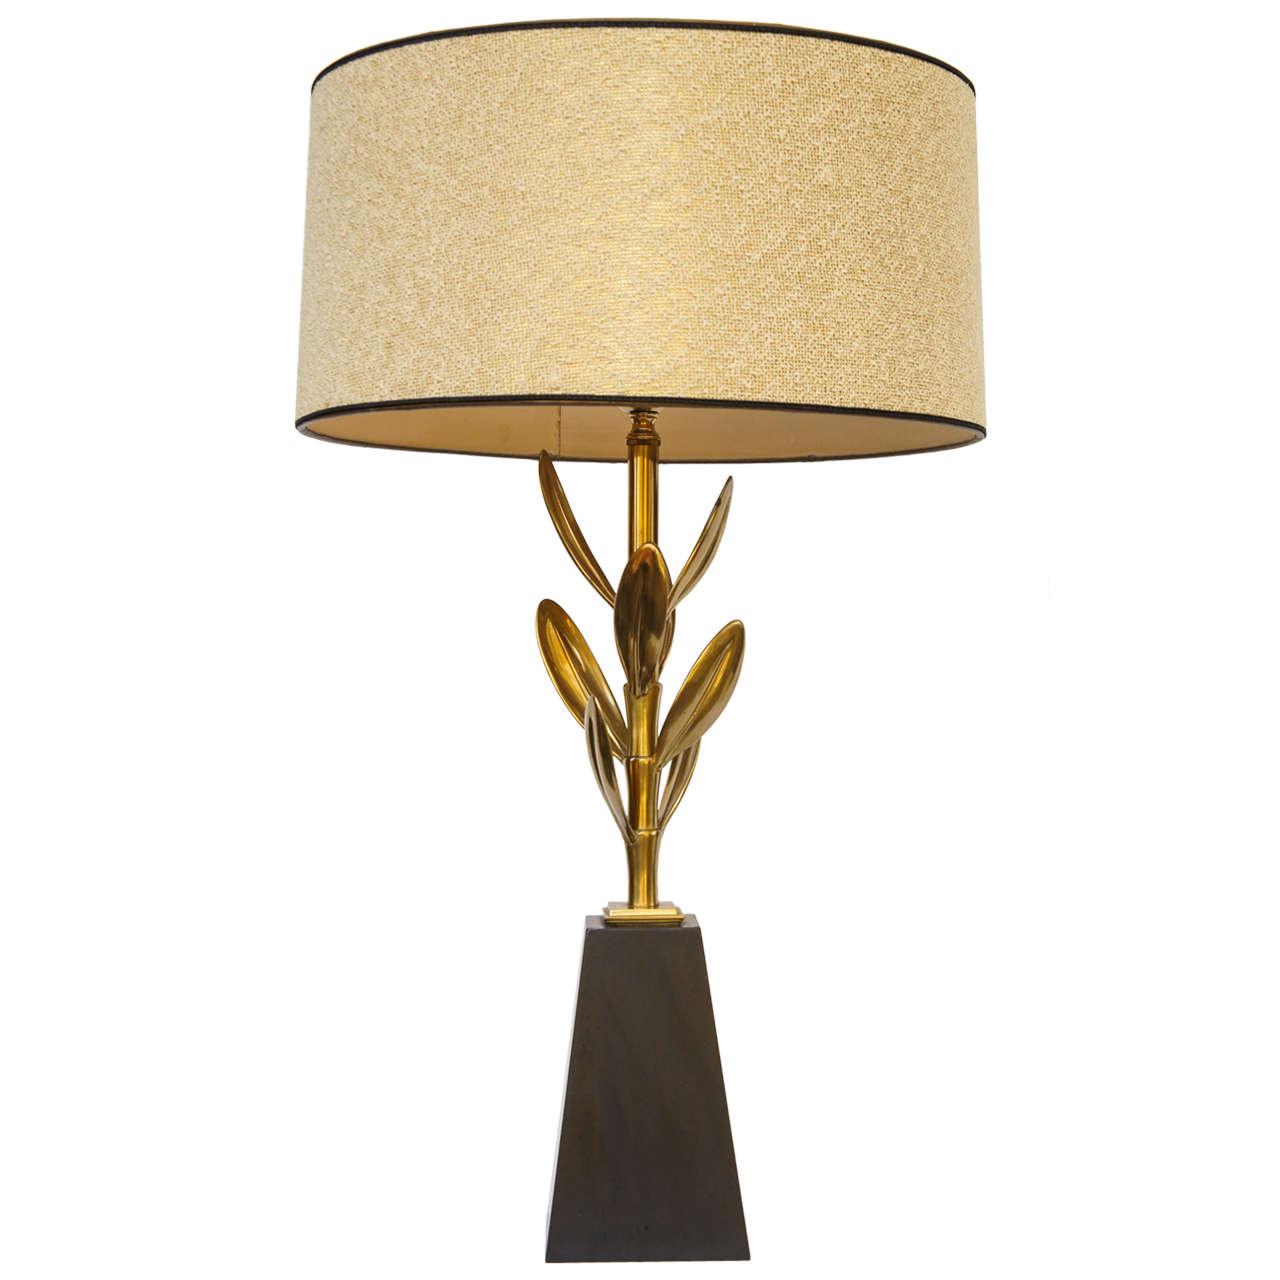 70's Mid Century Modern Stiffel Brass Sedum Lamp Lamp